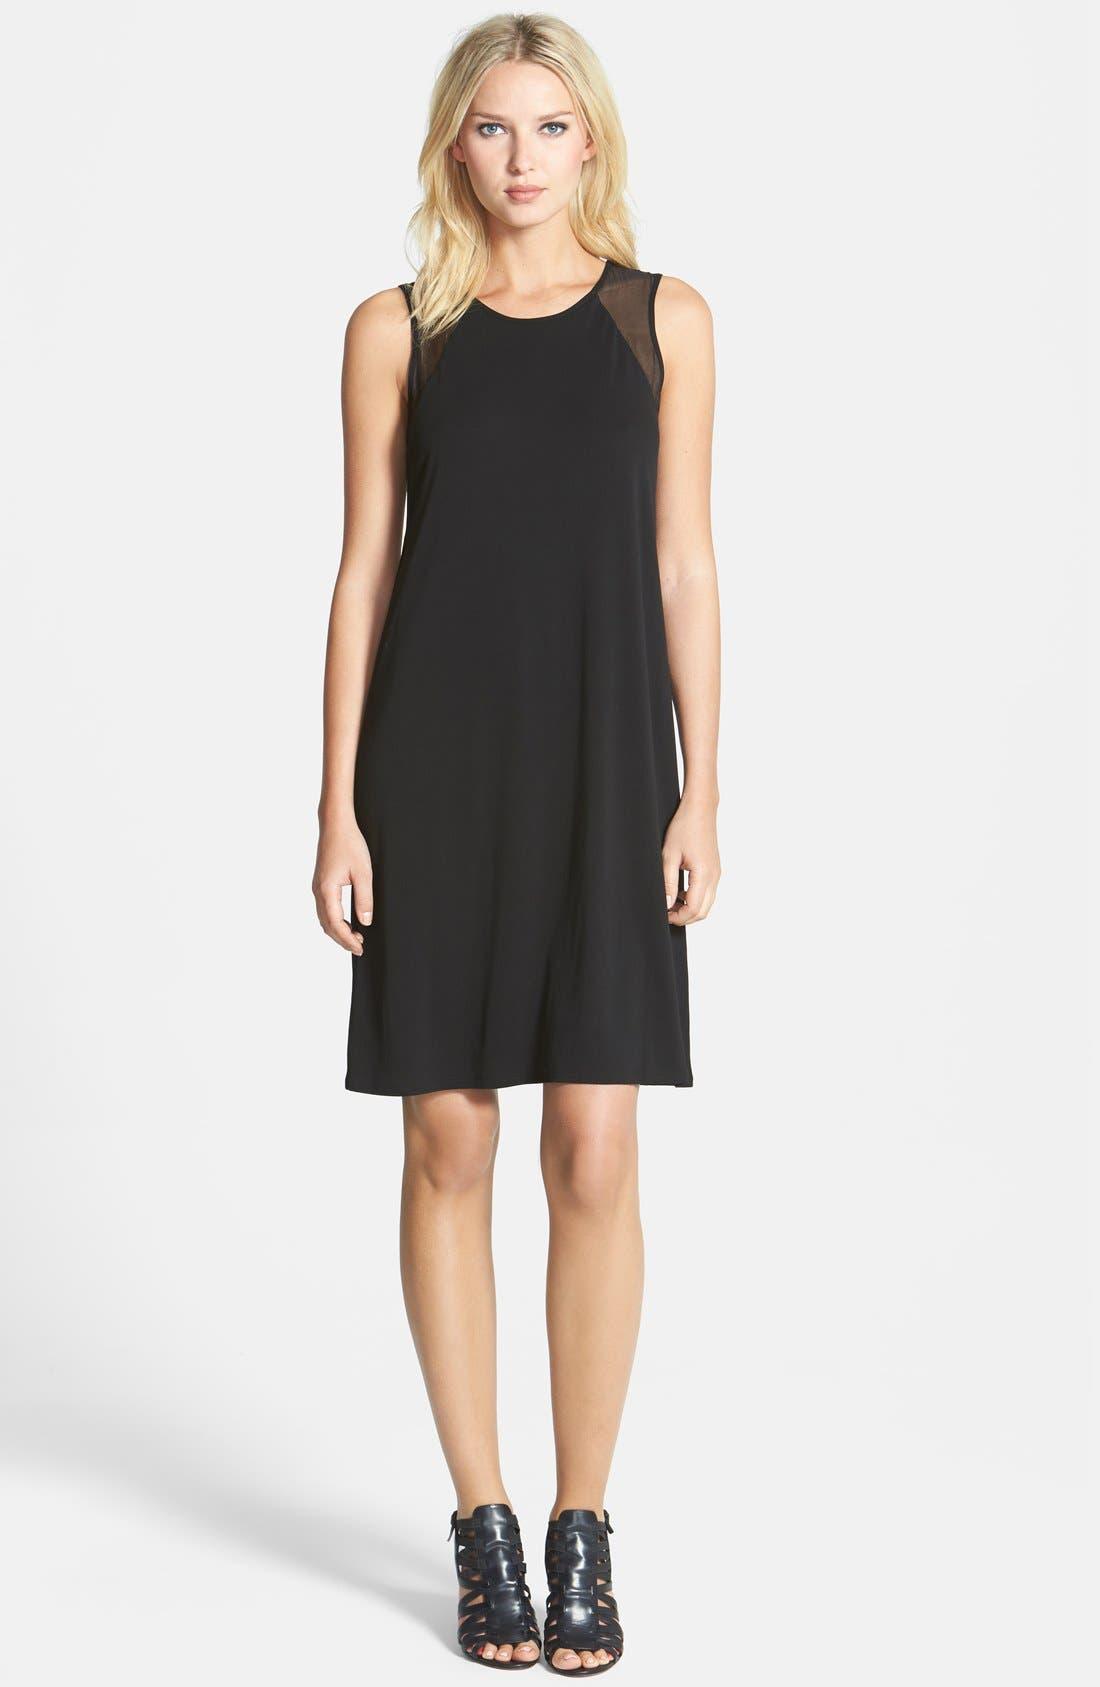 Alternate Image 1 Selected - Eileen Fisher Sheer Shoulder A-Line Silk Shift Dress (Regular & Petite)